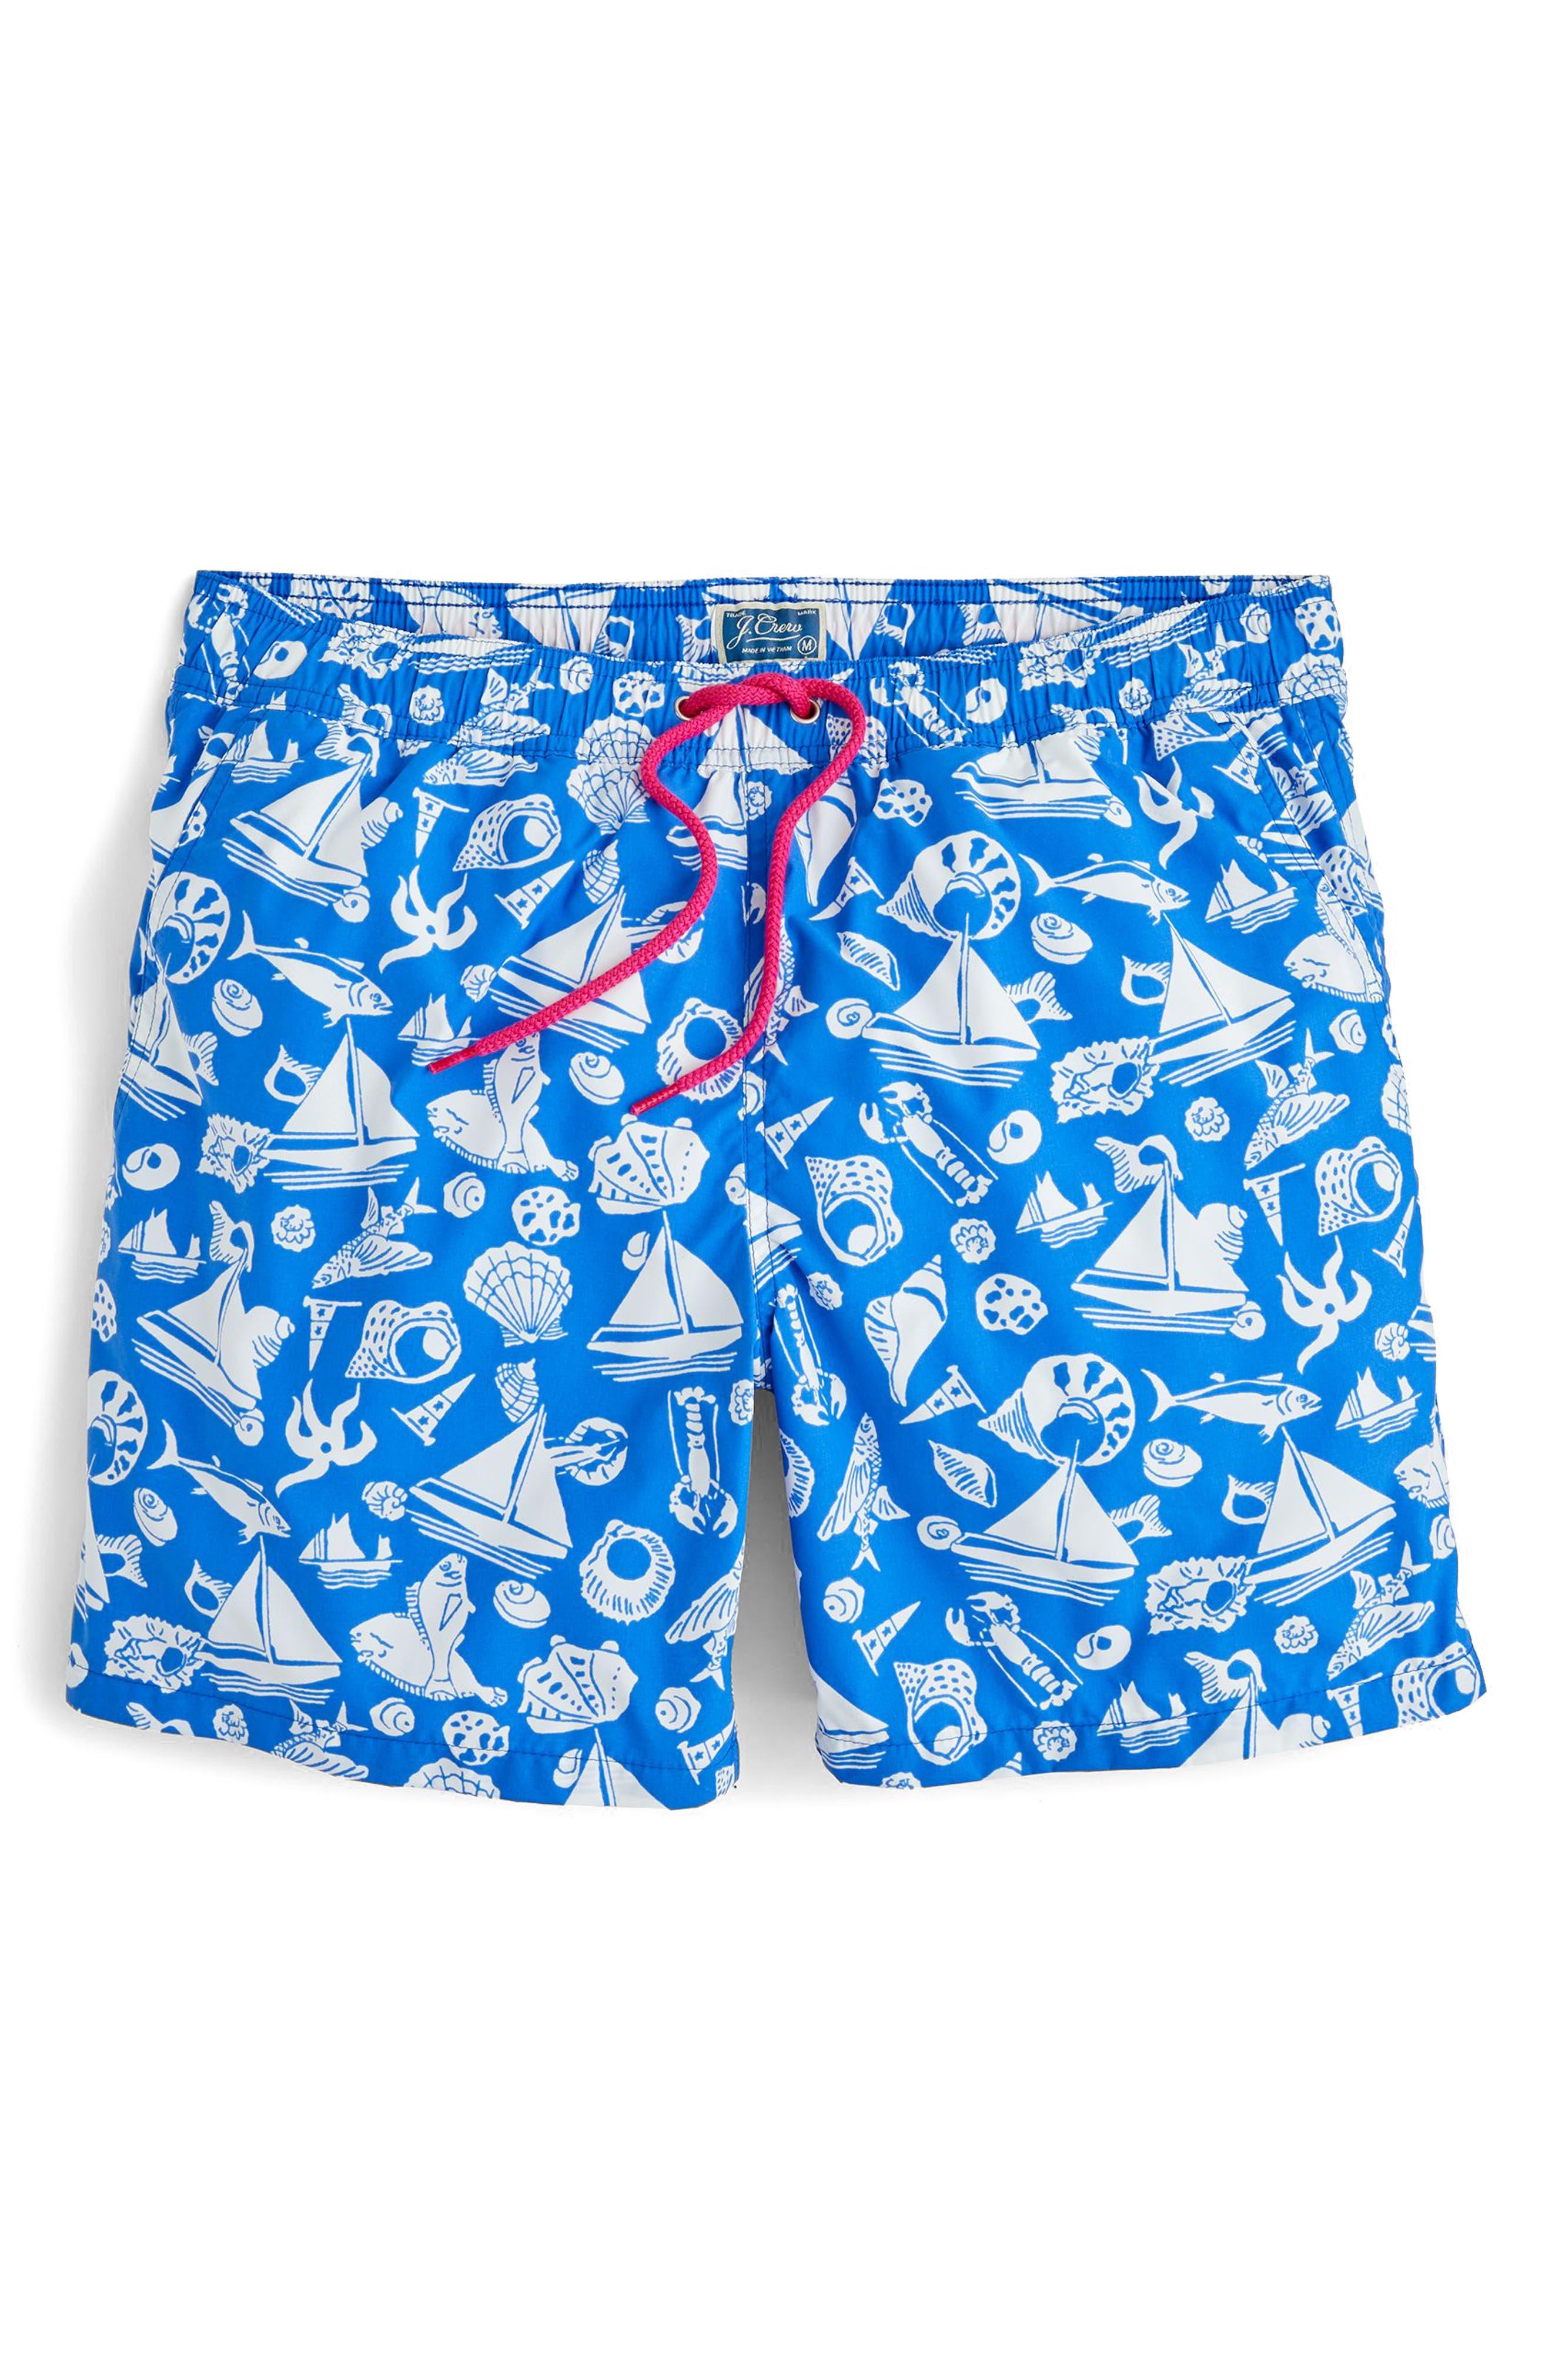 Seaside Print Swim Trunks,                         Main,                         color, Royal Bay